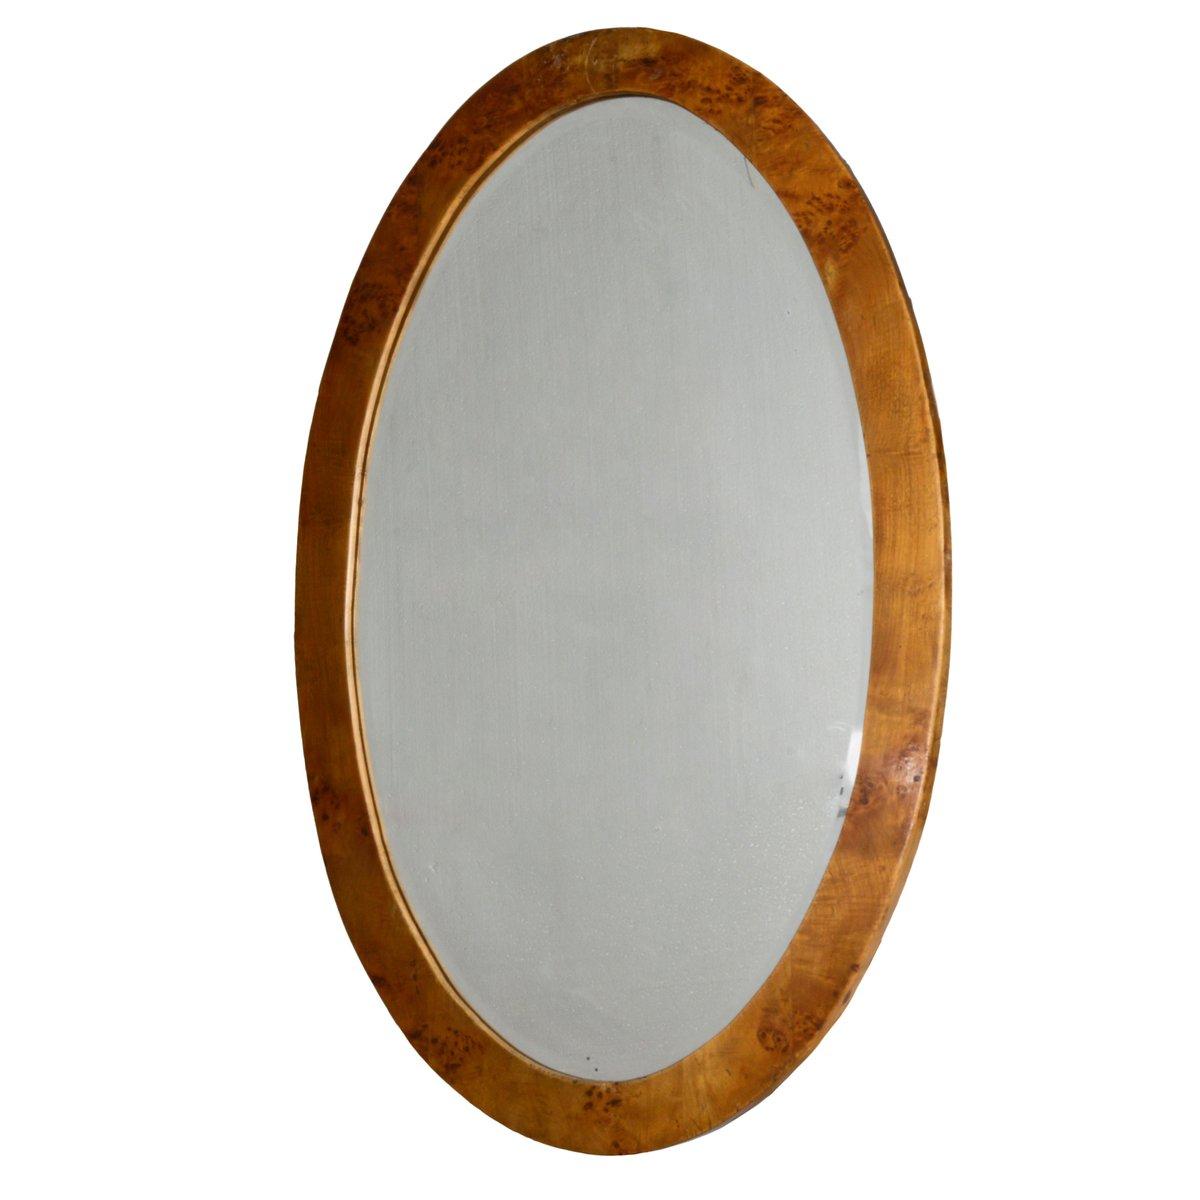 miroir ovale art d co en broussin italie 1930s en vente. Black Bedroom Furniture Sets. Home Design Ideas